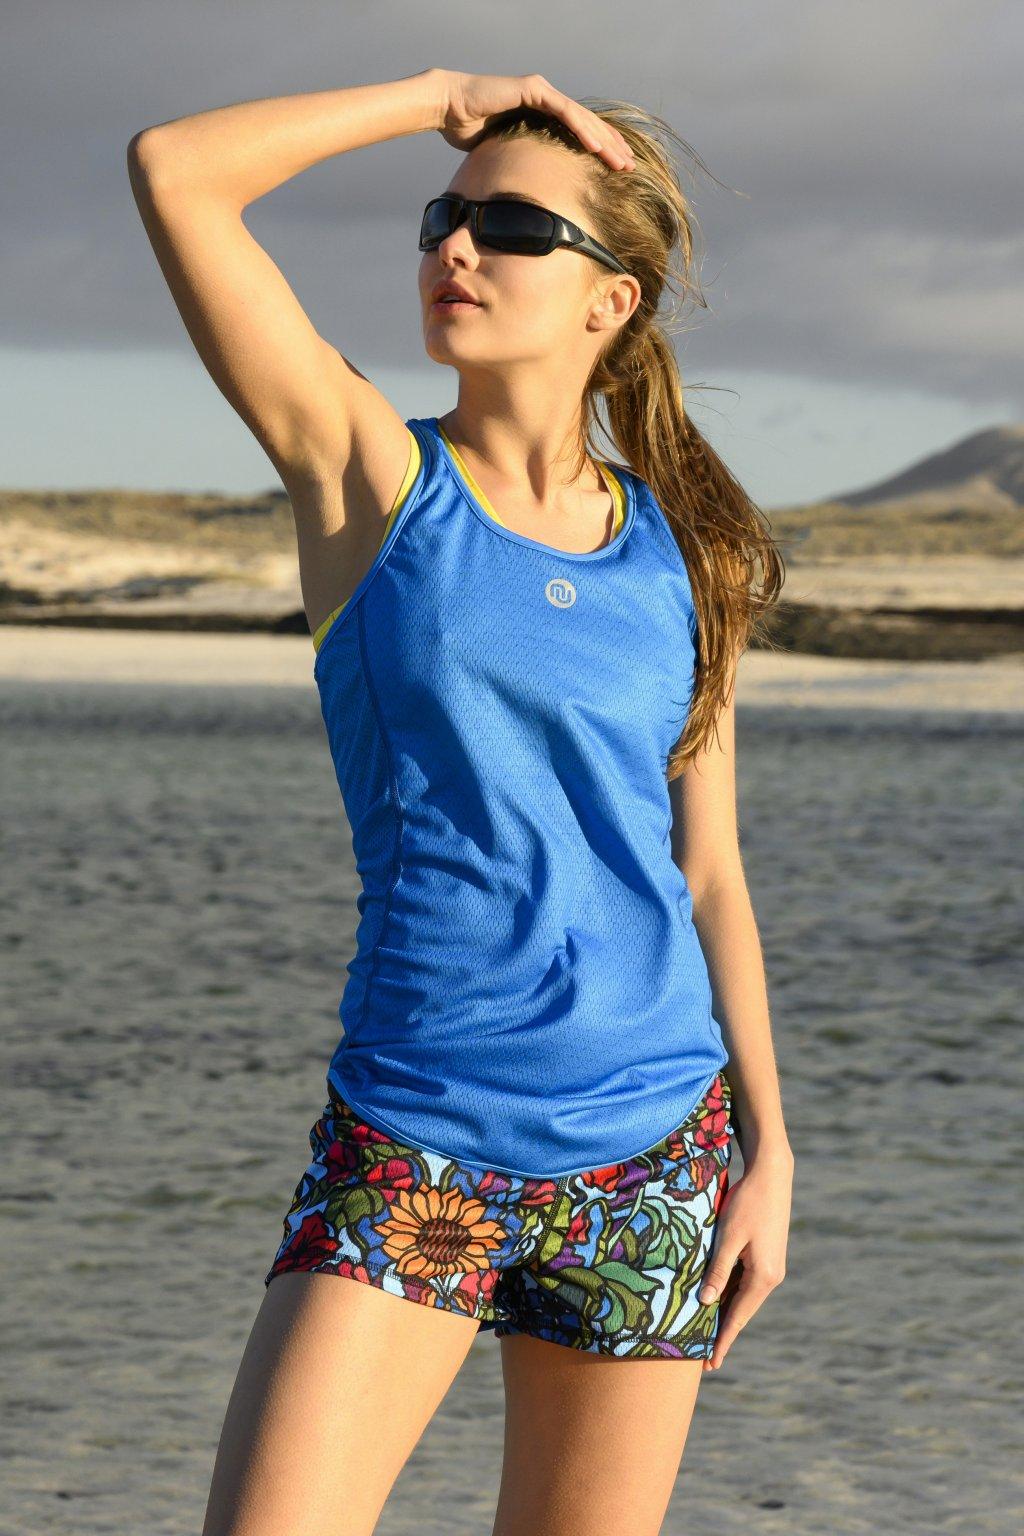 Volný top boxer blue mirage dbl 11x7 1